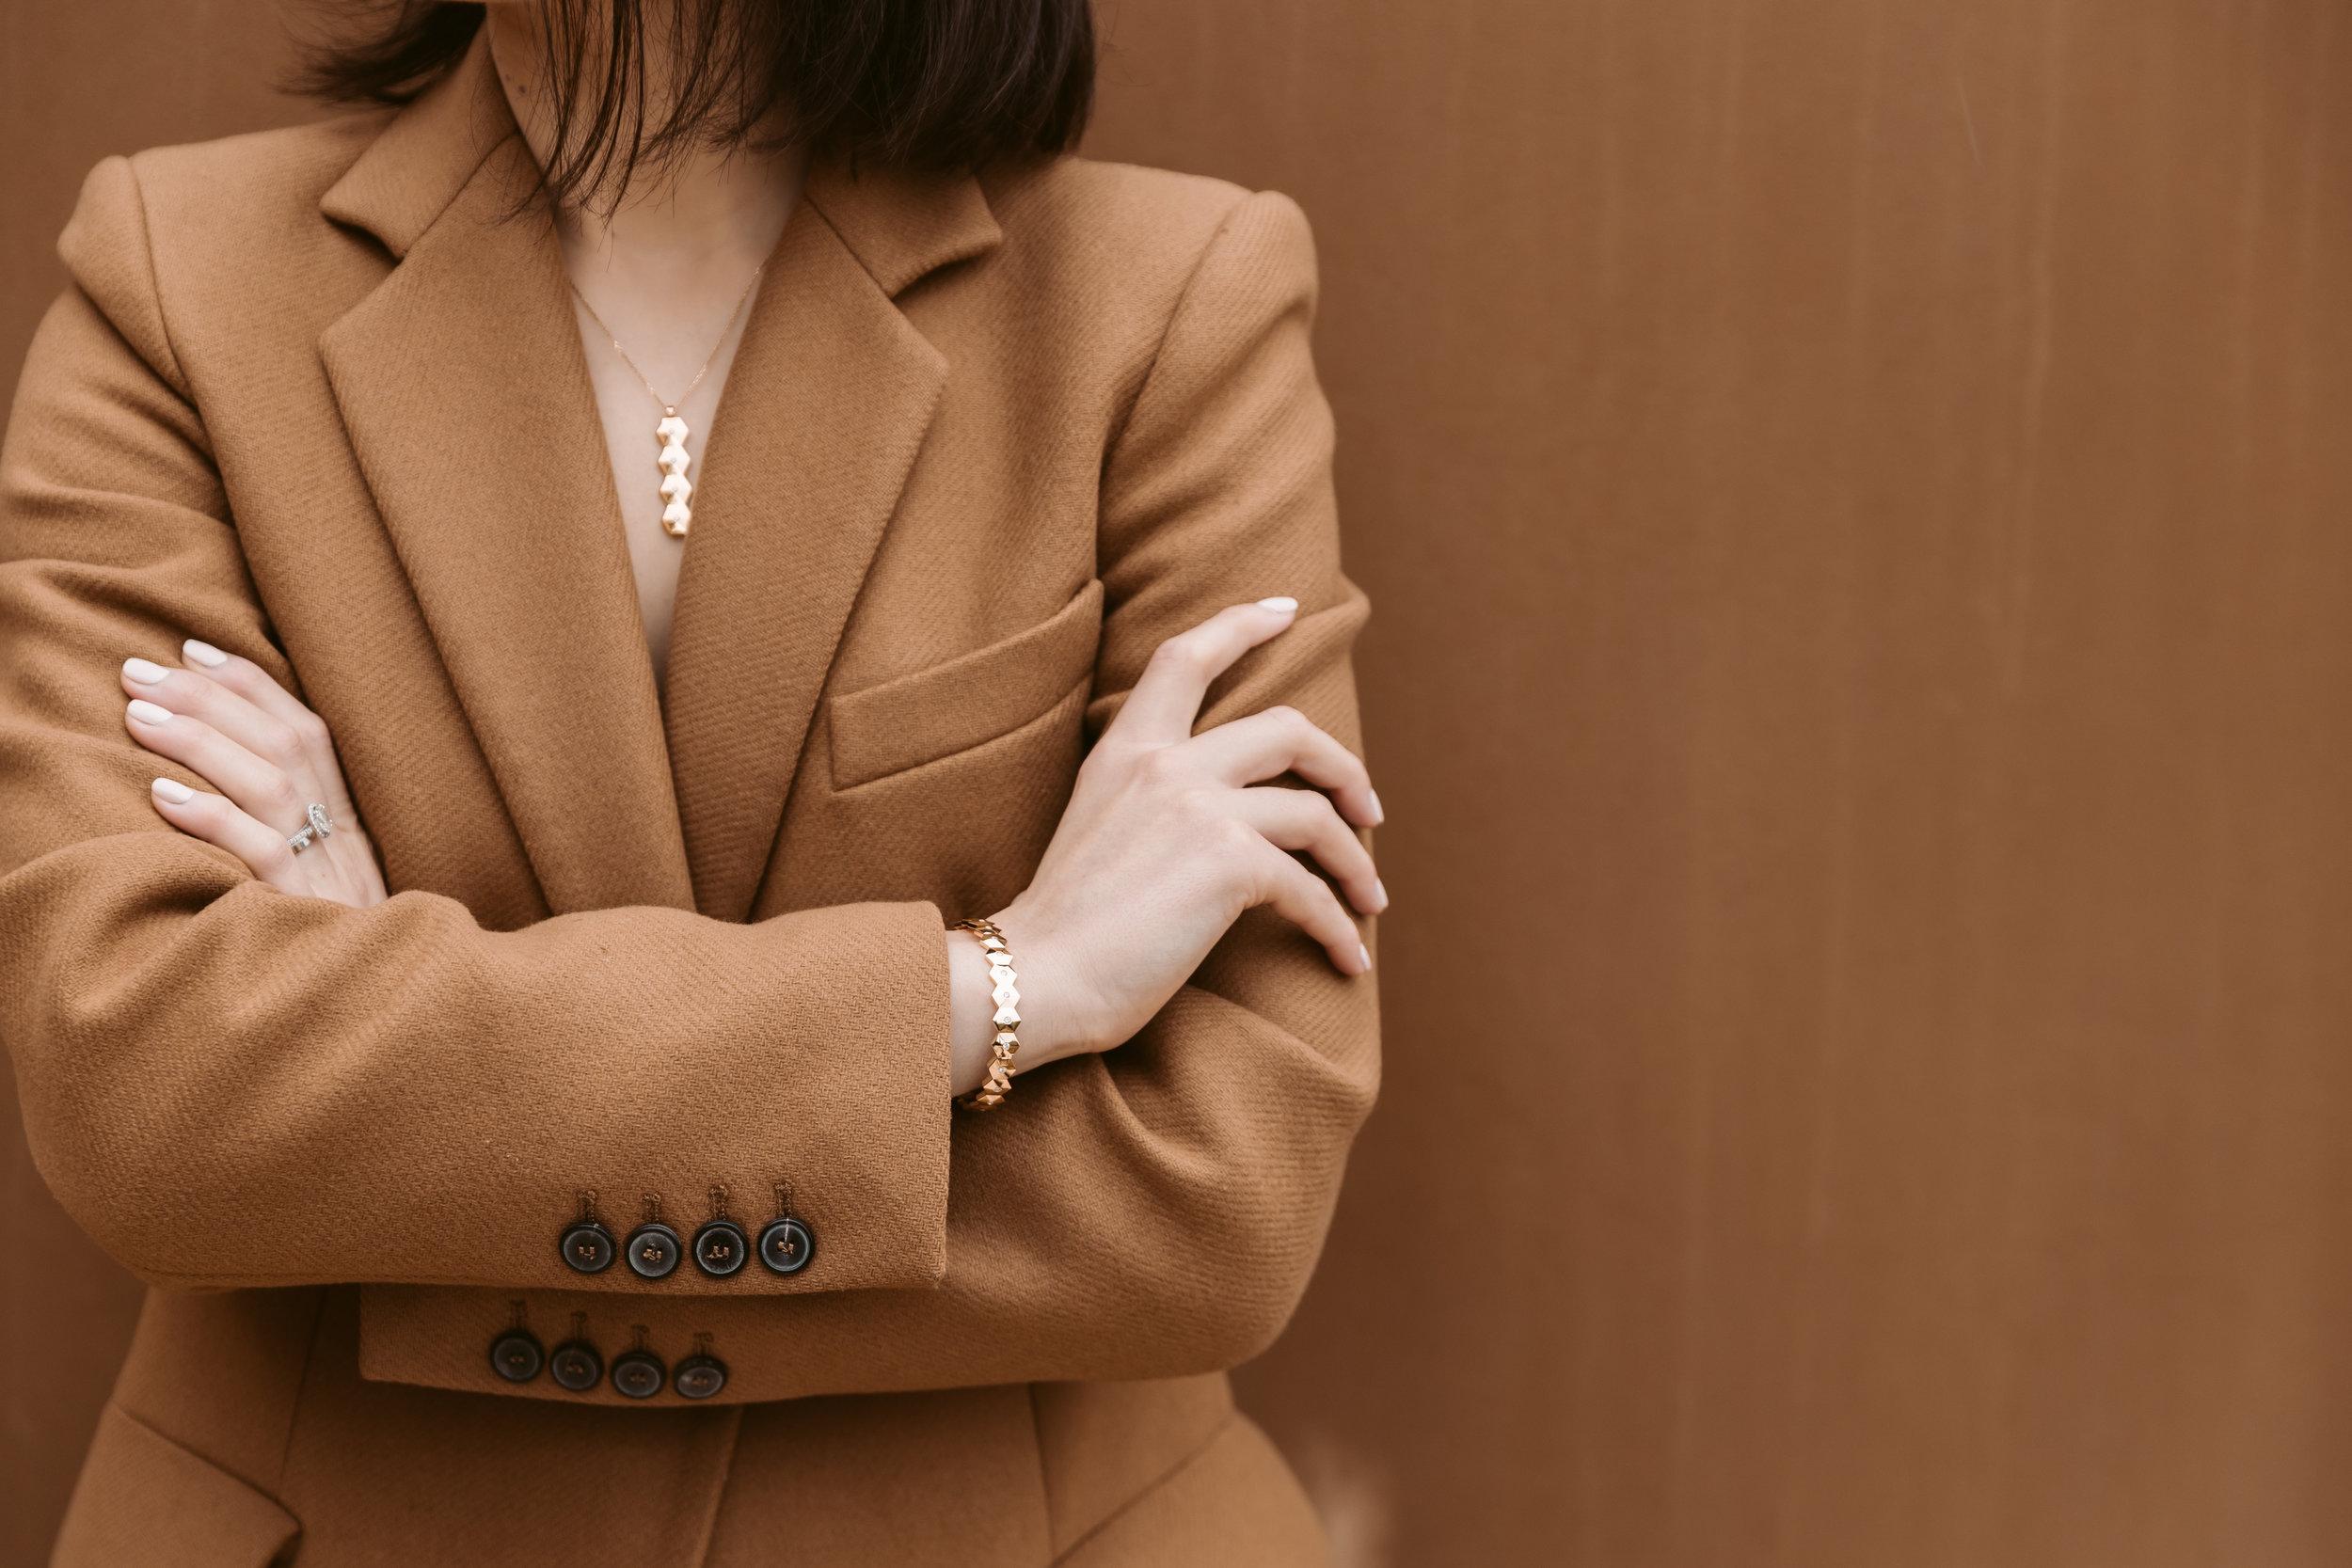 ABE1_Marioni_Jewelry_Lifestyle-4.jpg